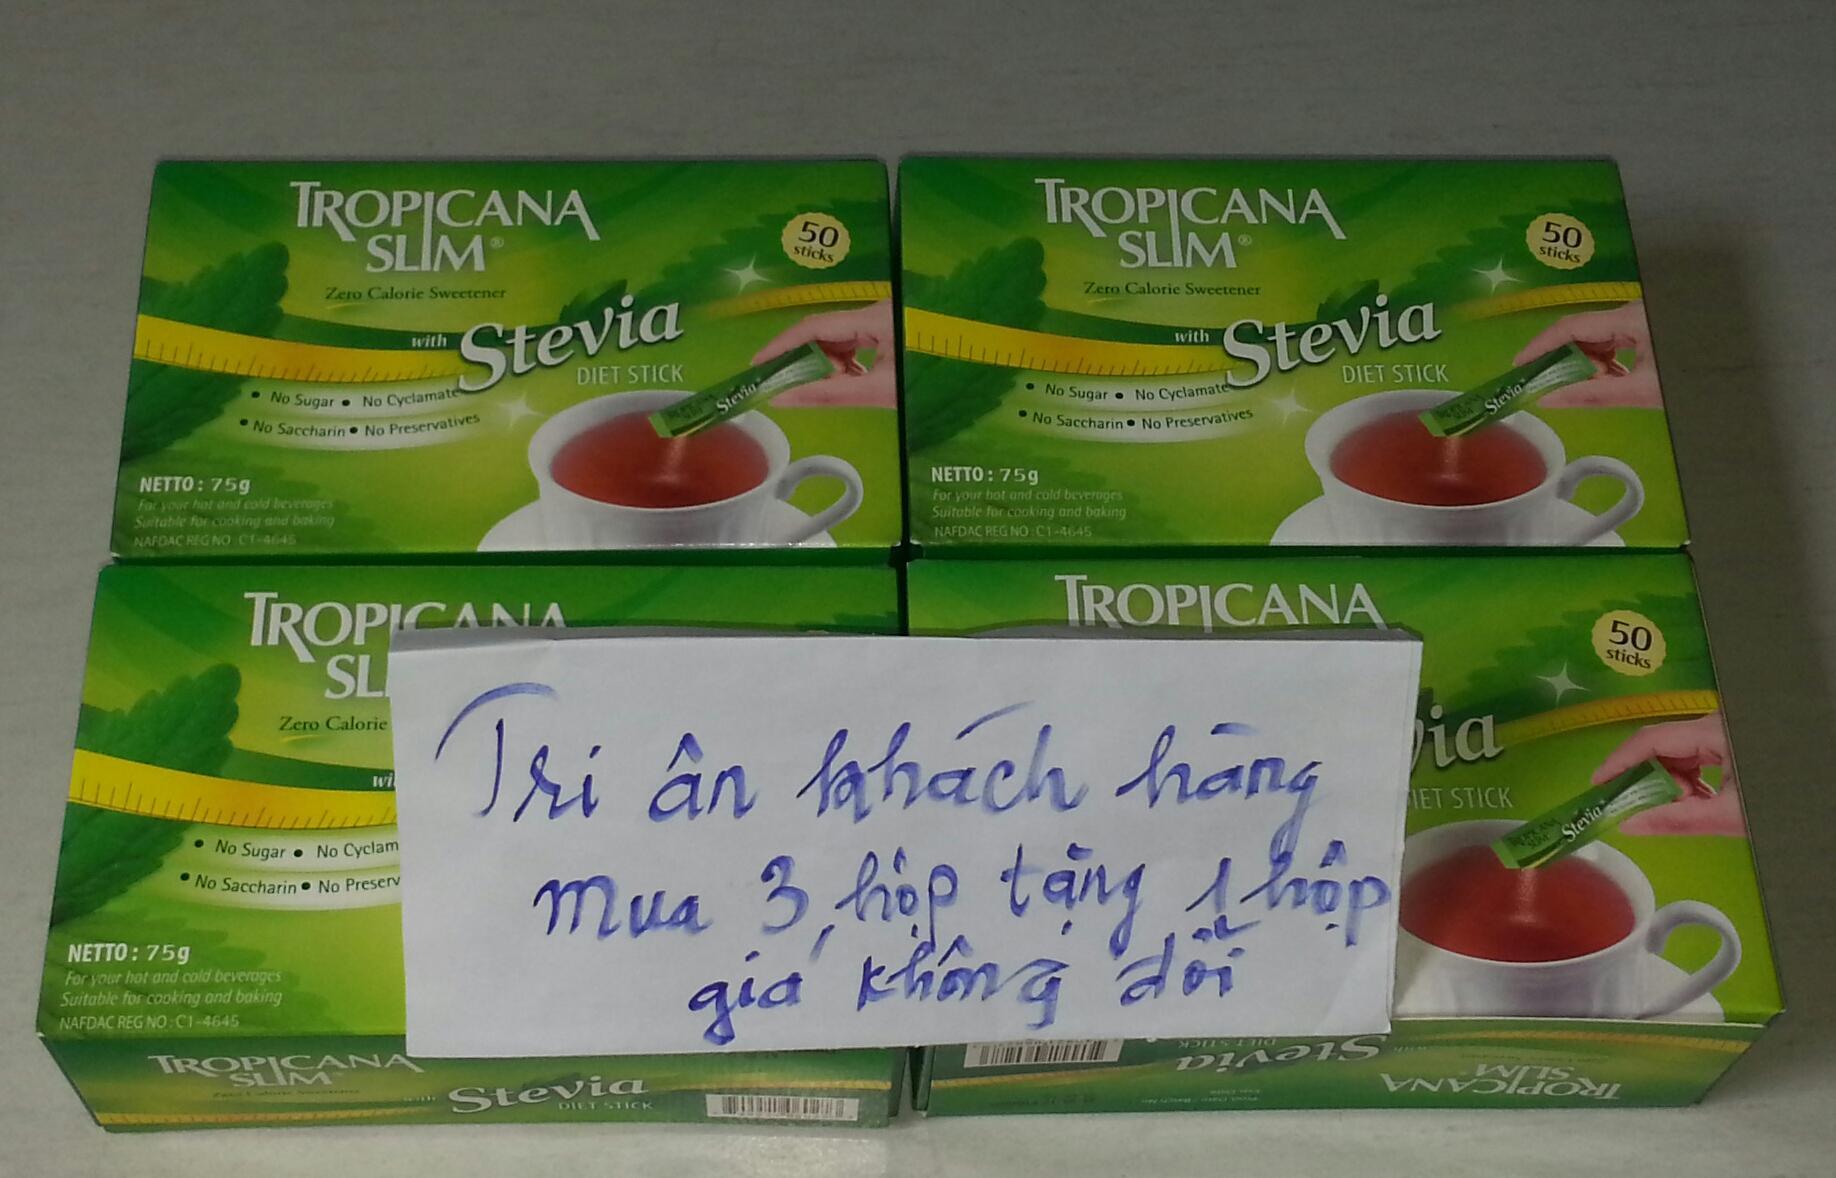 Mua Bch Ha Online Nutrifood Gi Tt Tropicana Slim Stevia 3 Hp Tng 1 Ng Cng Loi B N